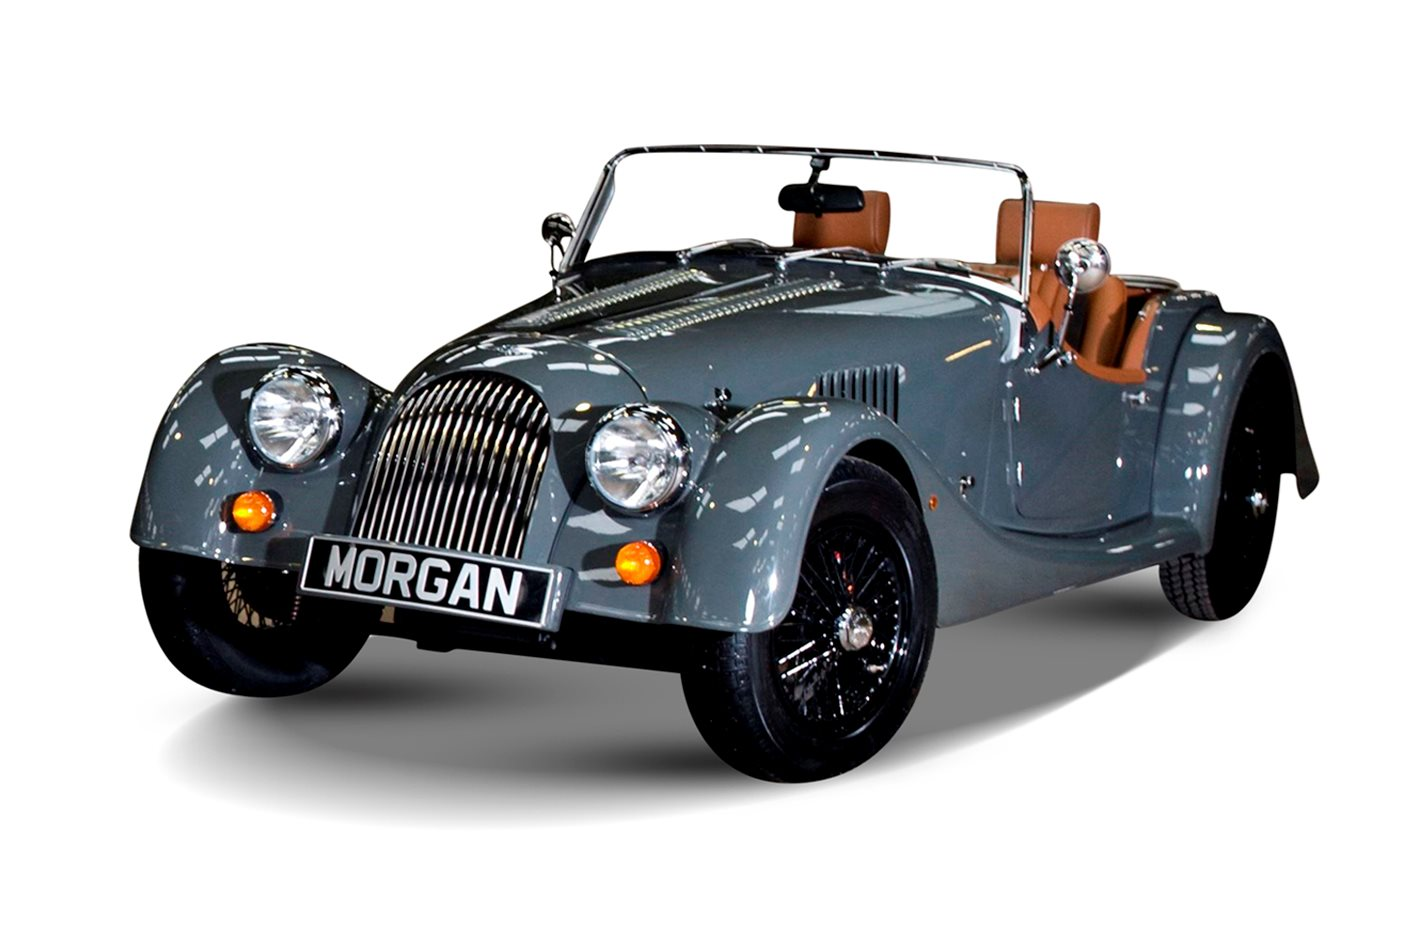 2019 Morgan Roadster, 3 7L 6cyl Petrol Manual, Convertible